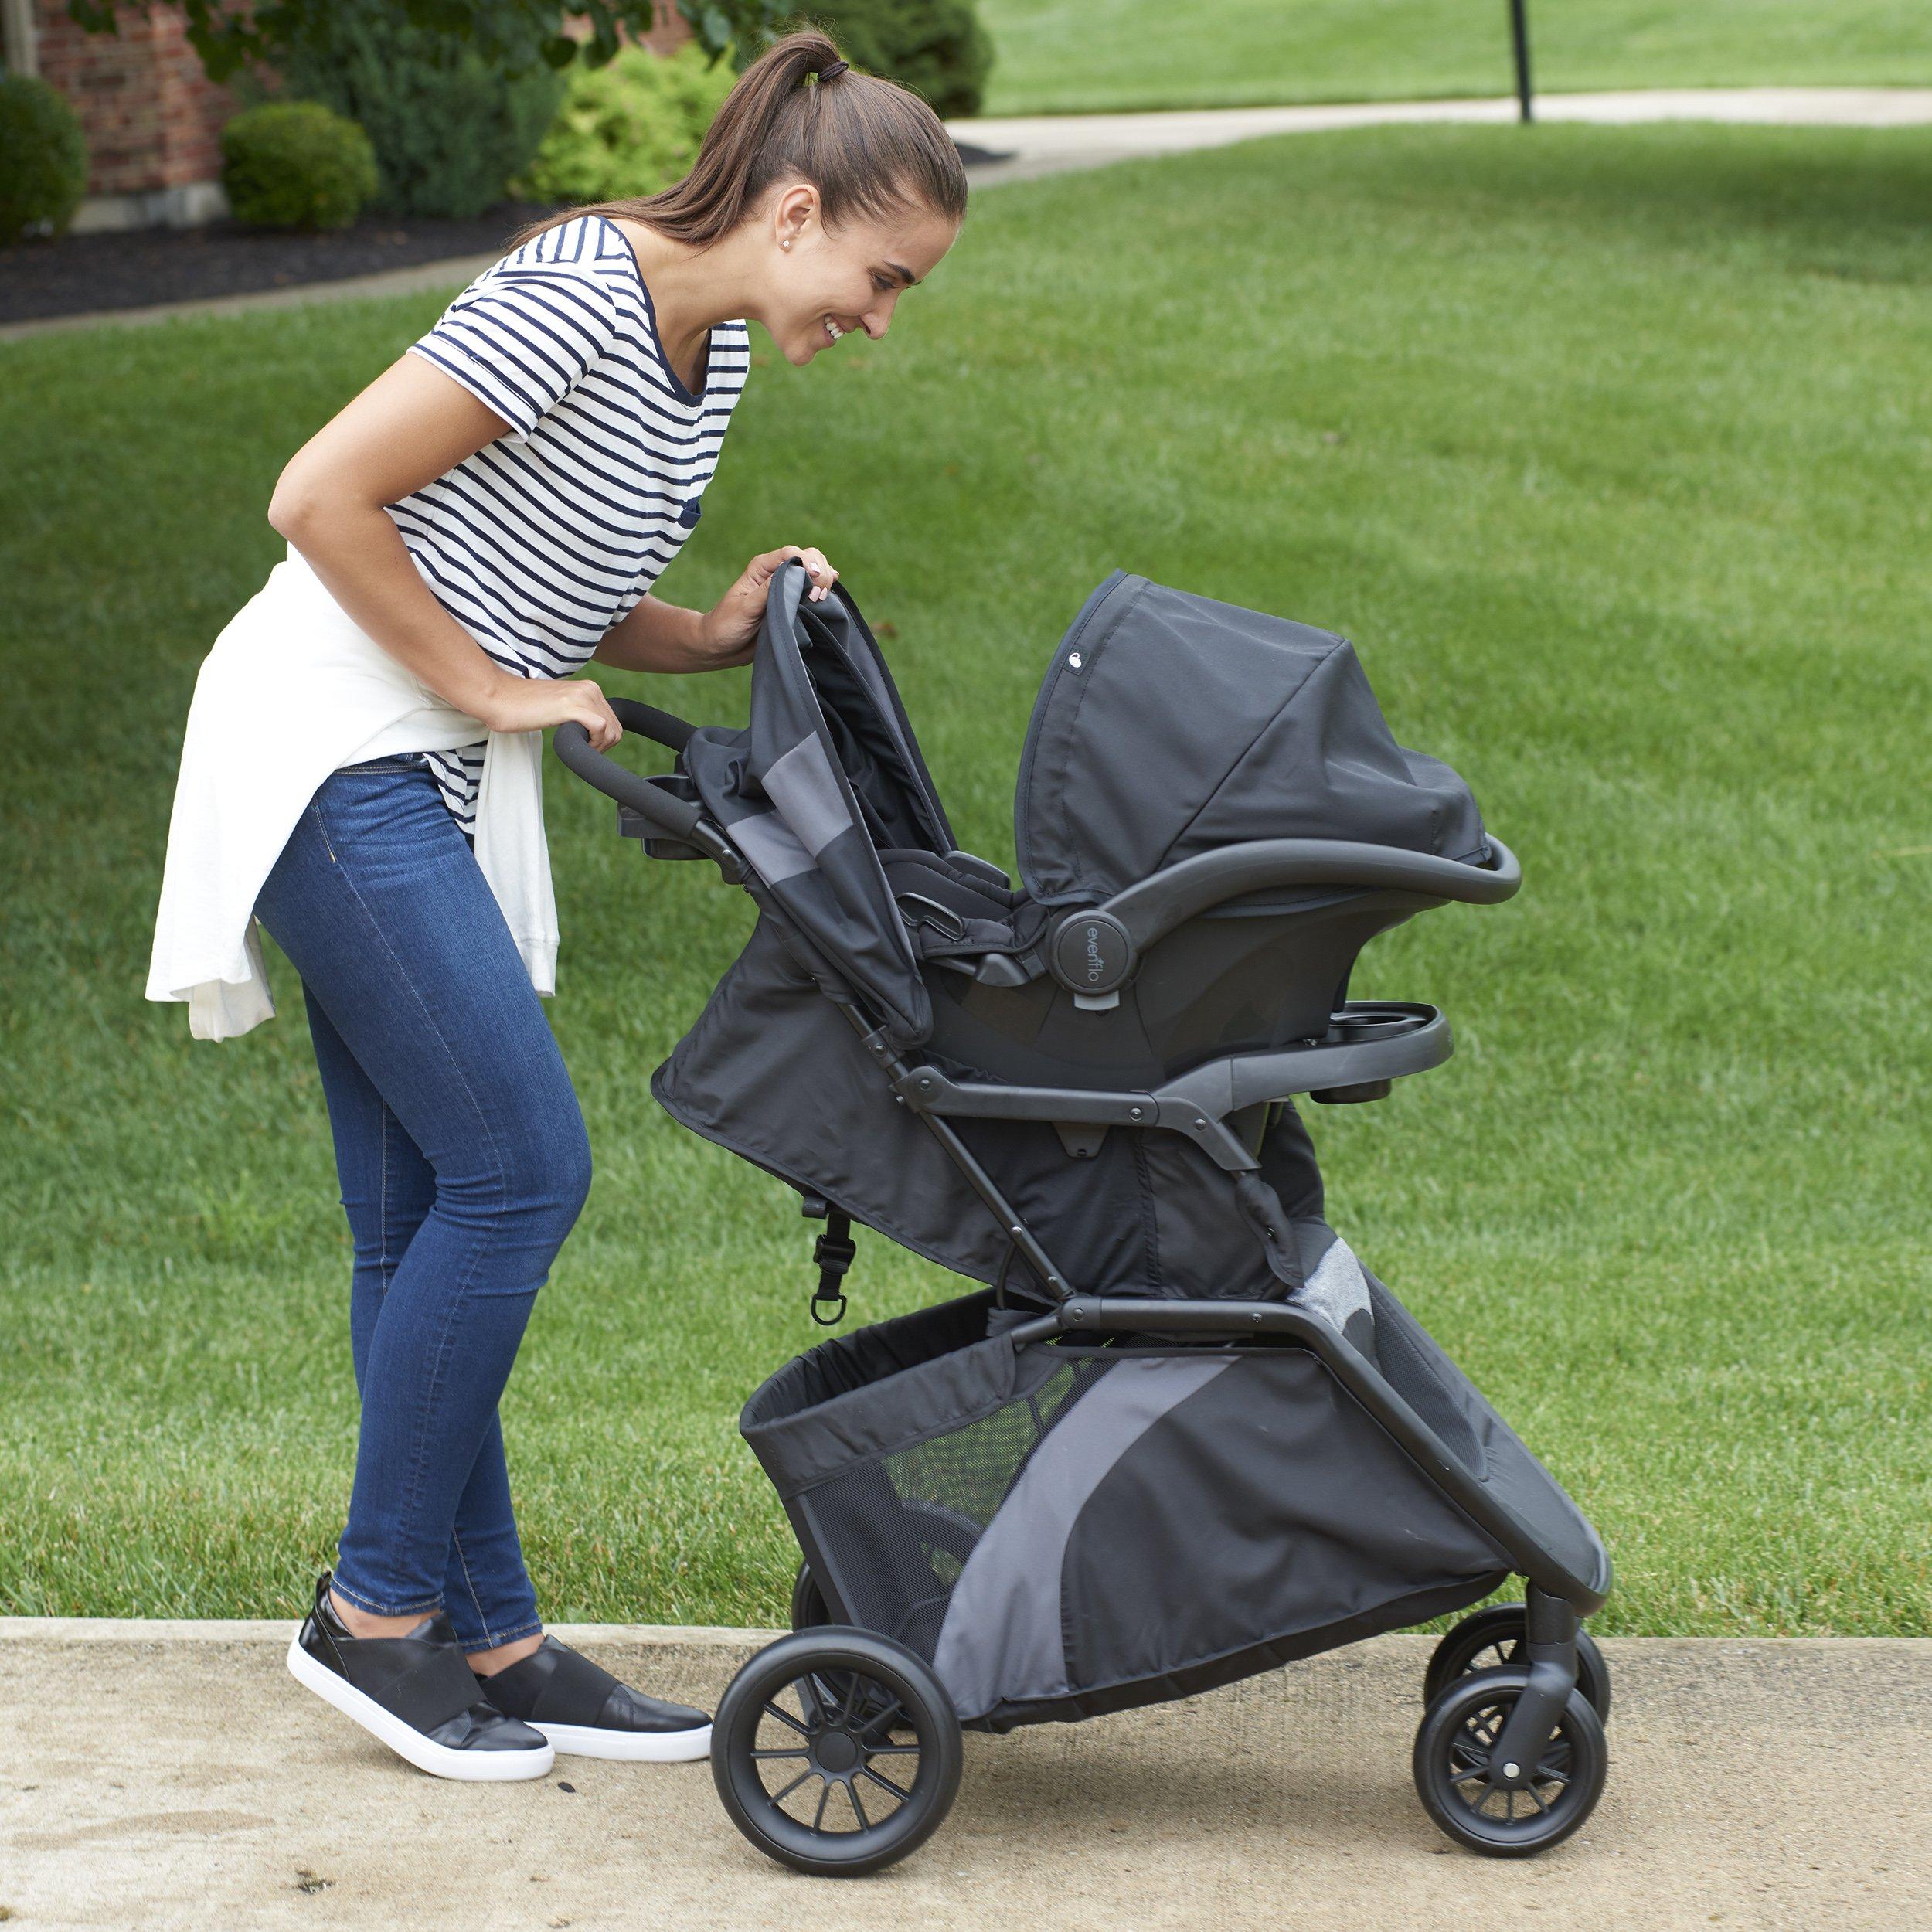 Evenflo Advanced SensorSafe Epic Travel System with LiteMax Infant Car Seat, Jet by Evenflo (Image #6)